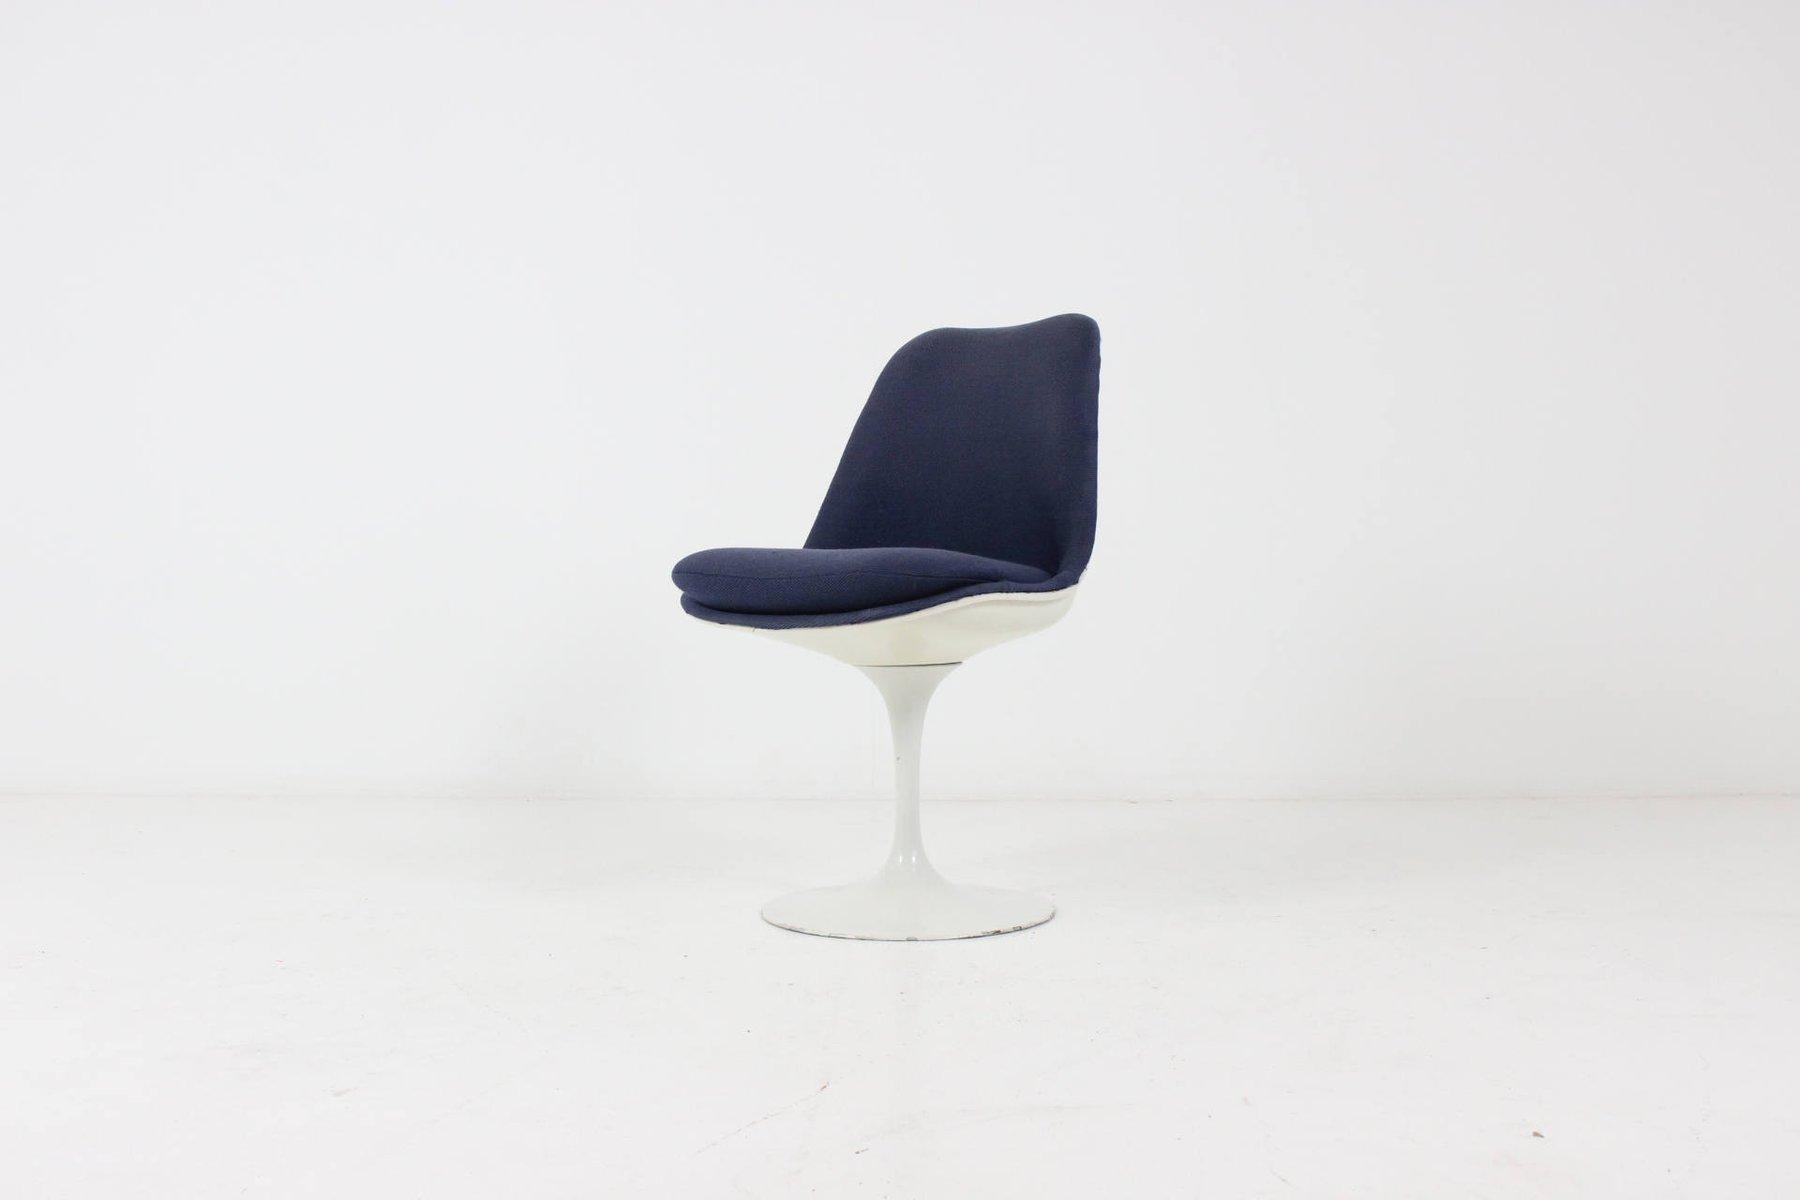 Swivel Tulip Chair By Eero Saarinen For Knoll